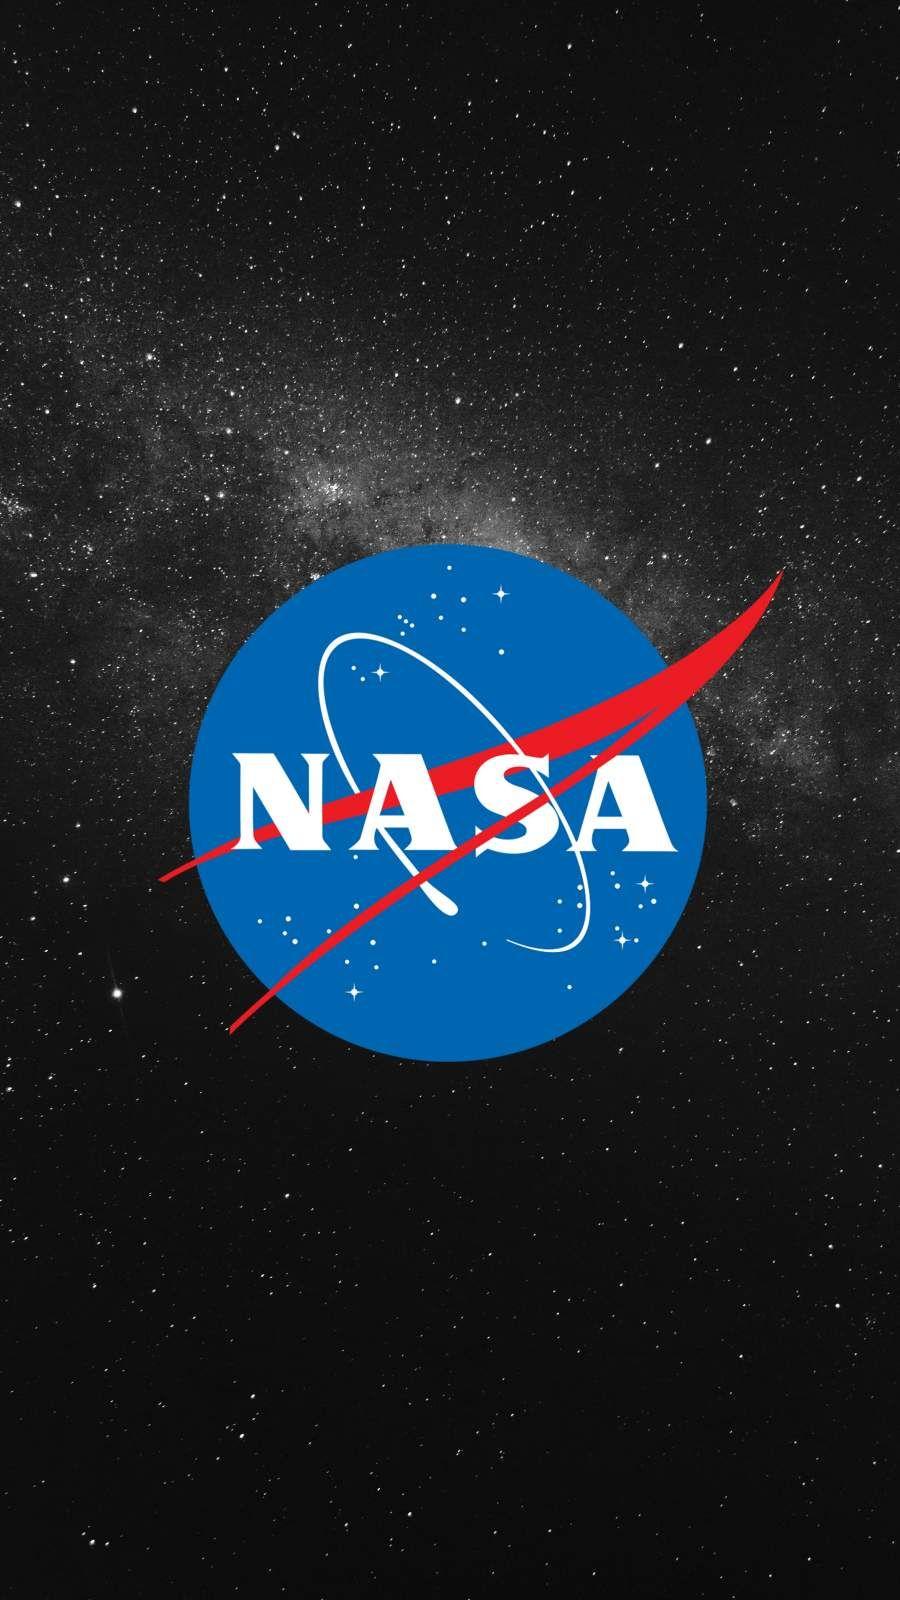 Nasa Iphone Wallpaper Papel De Parede De Astronauta Papel De Parede Samsung Papel De Parede Preto